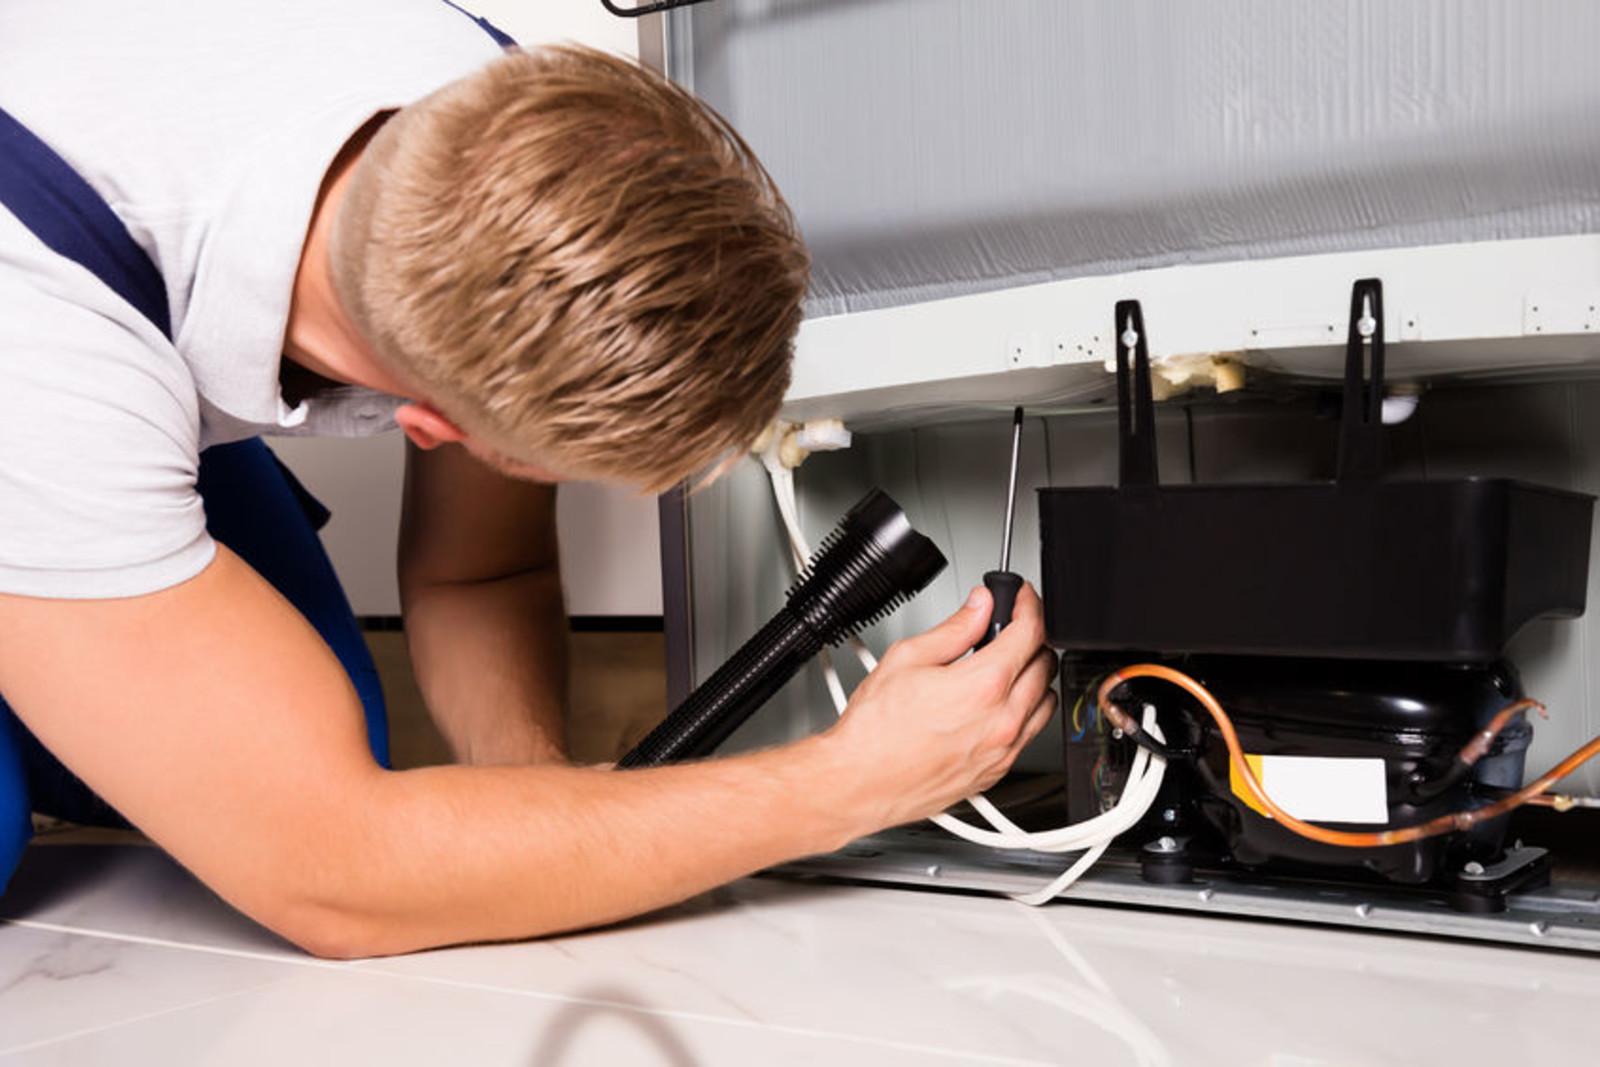 Appliance hook up service near me